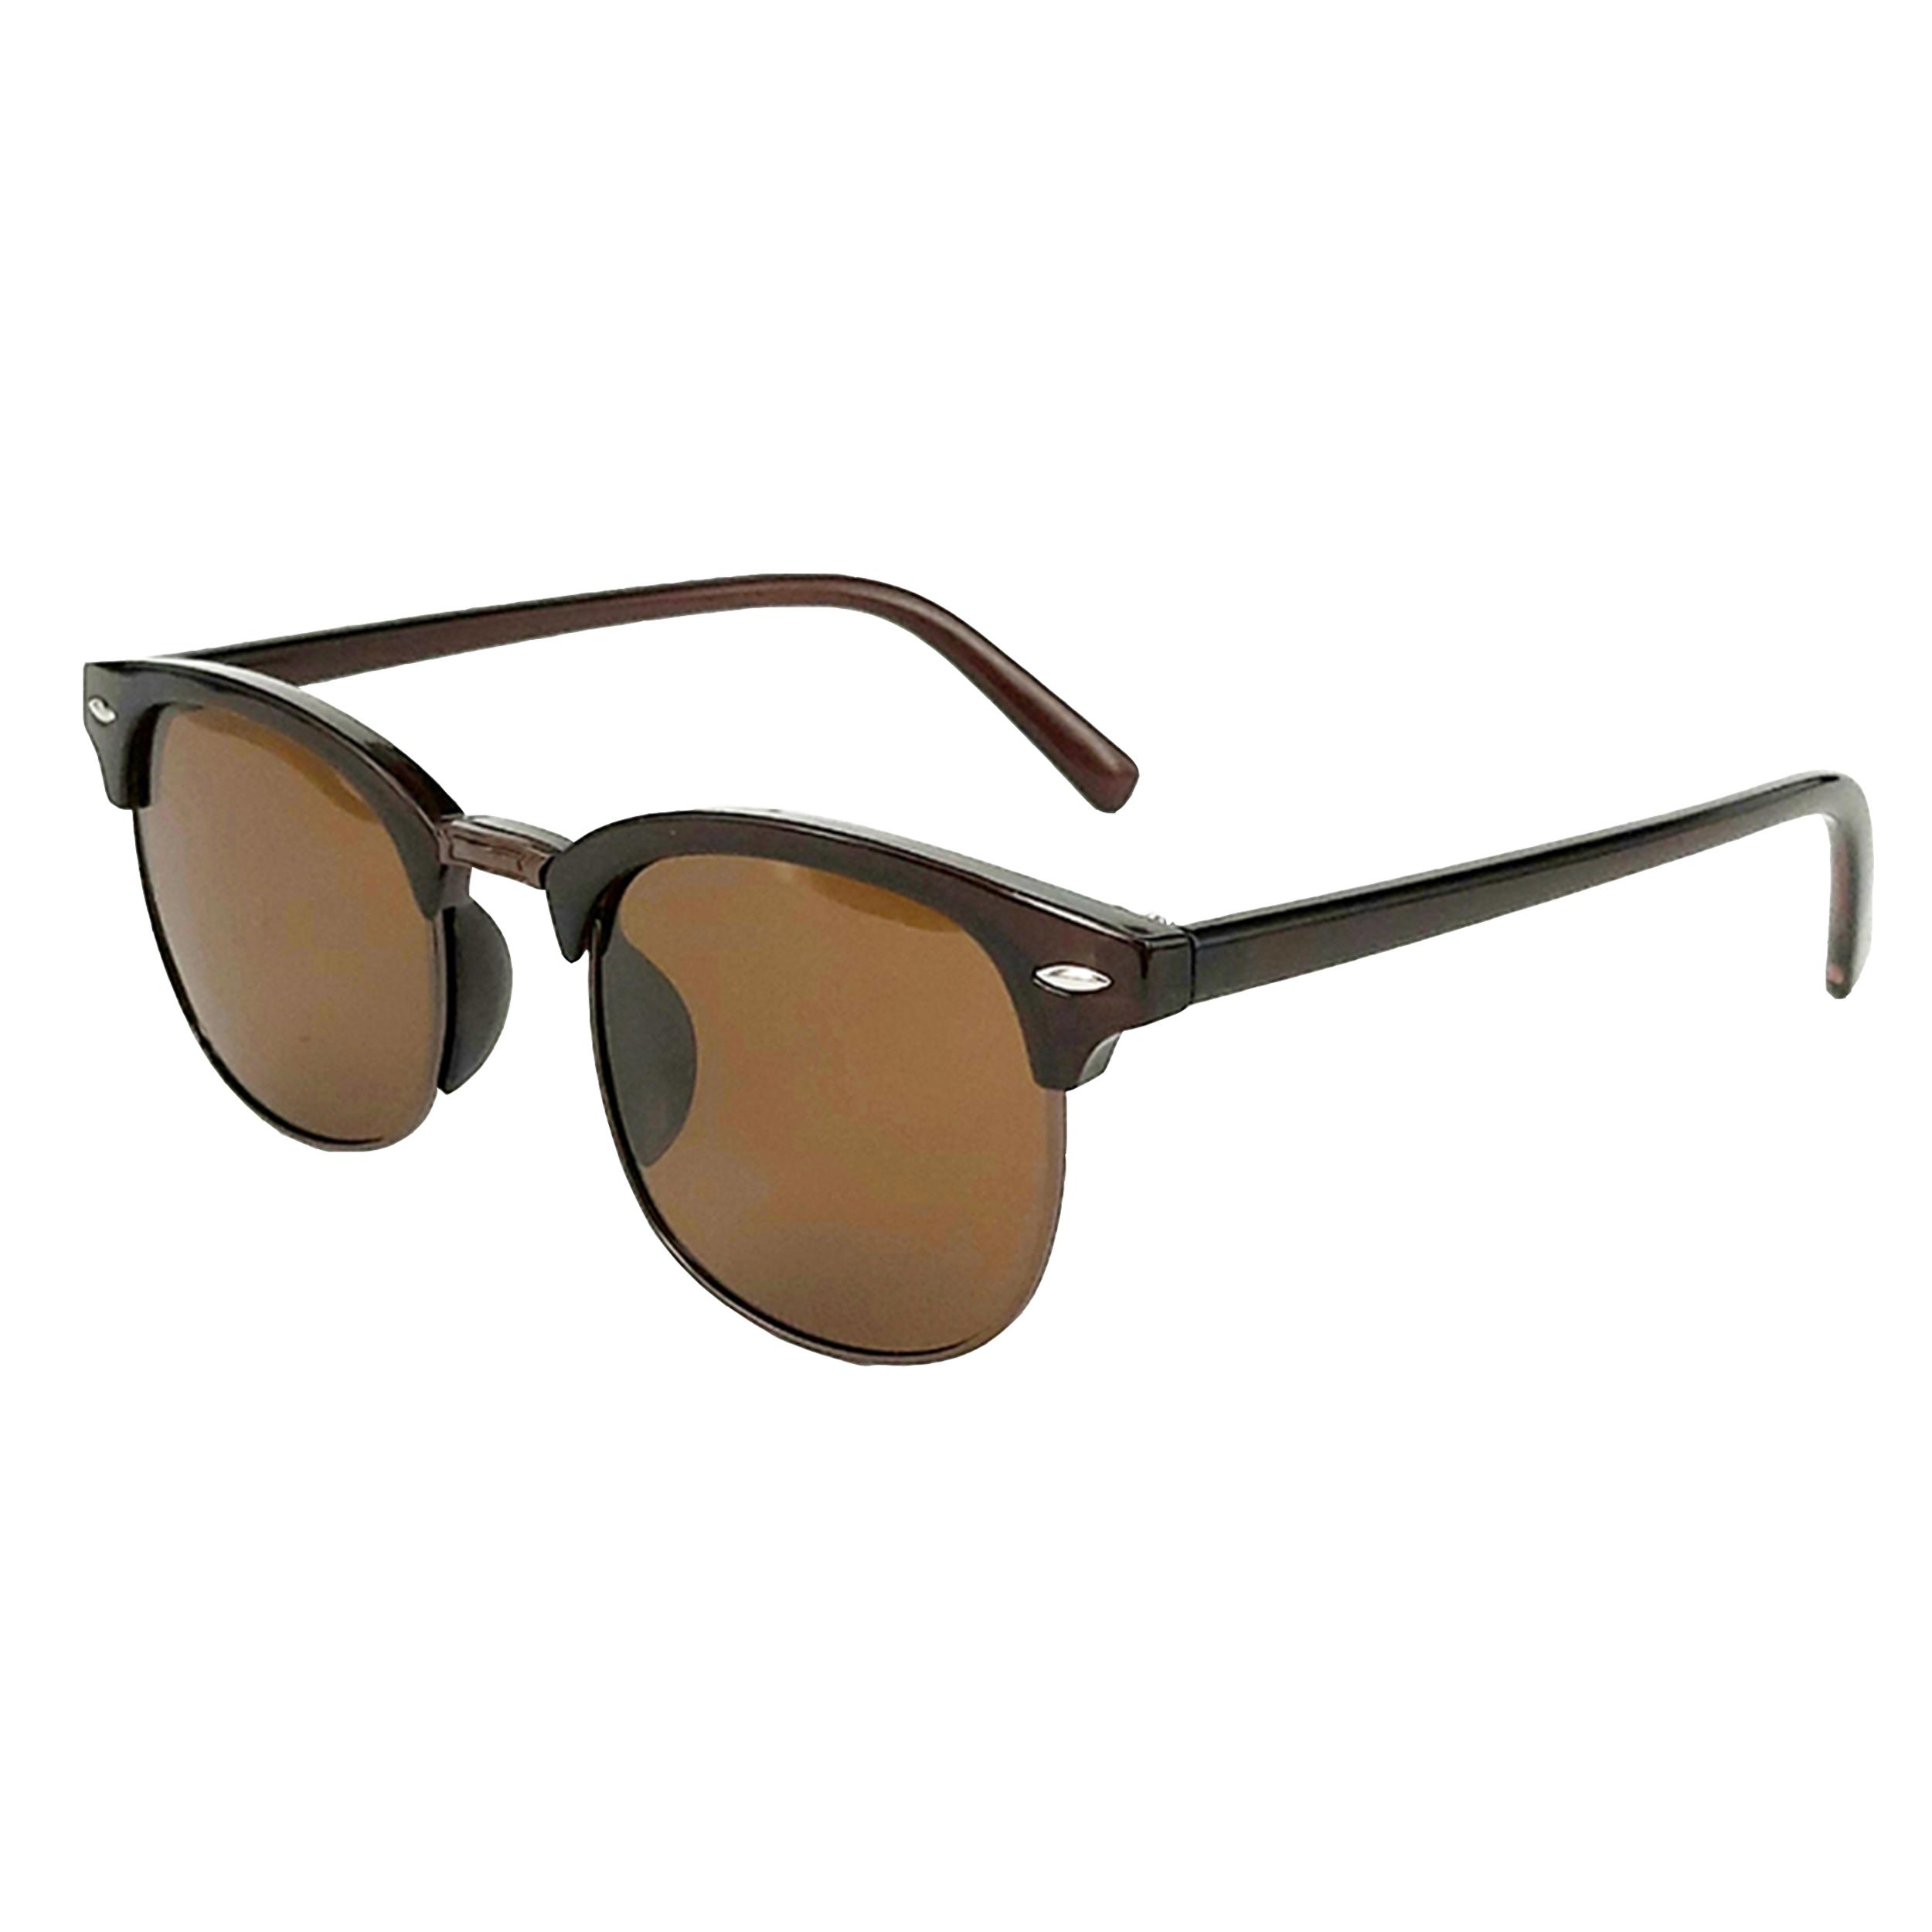 عینک آفتابی مدل b1001